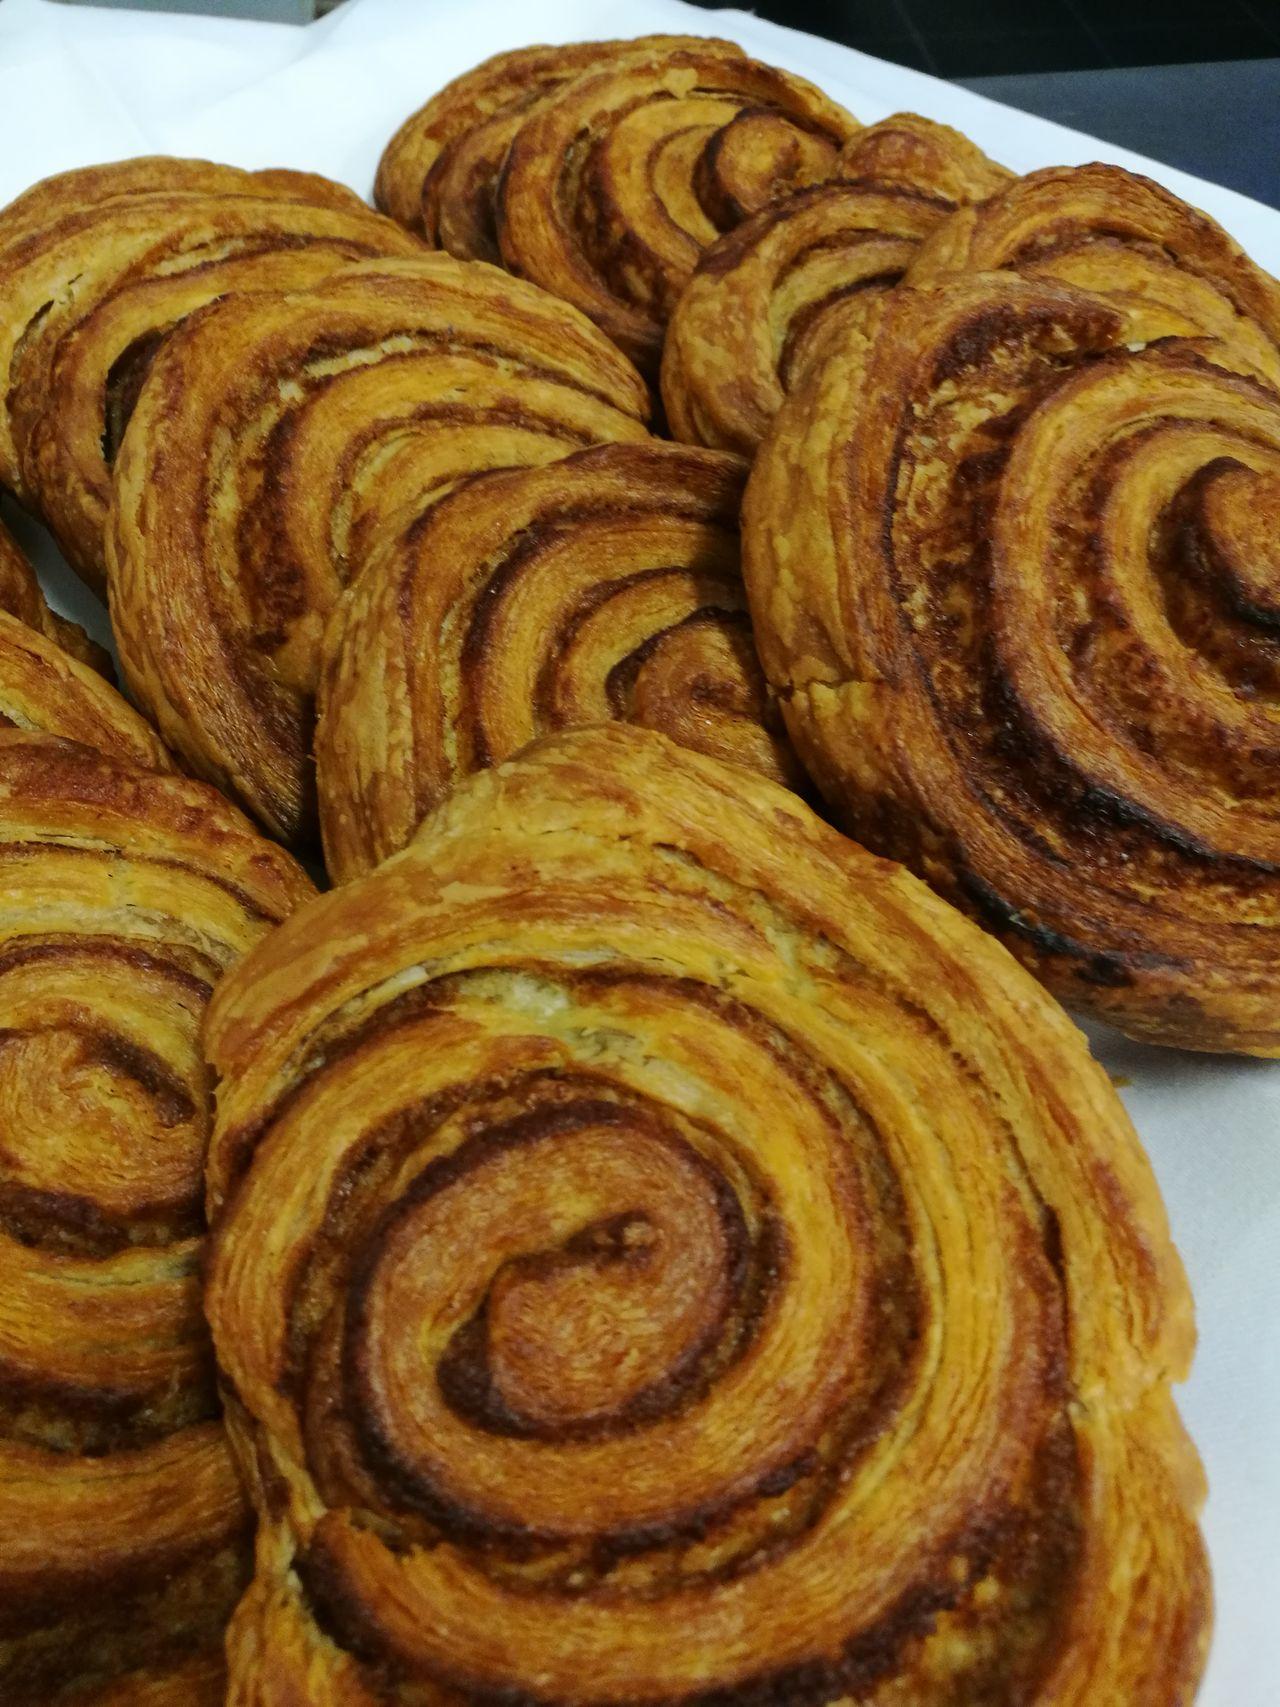 Cinamonroll Cinamon Sweatbreak Earlybird Food Indoors  Freshness Baked Close-up Ready-to-eat